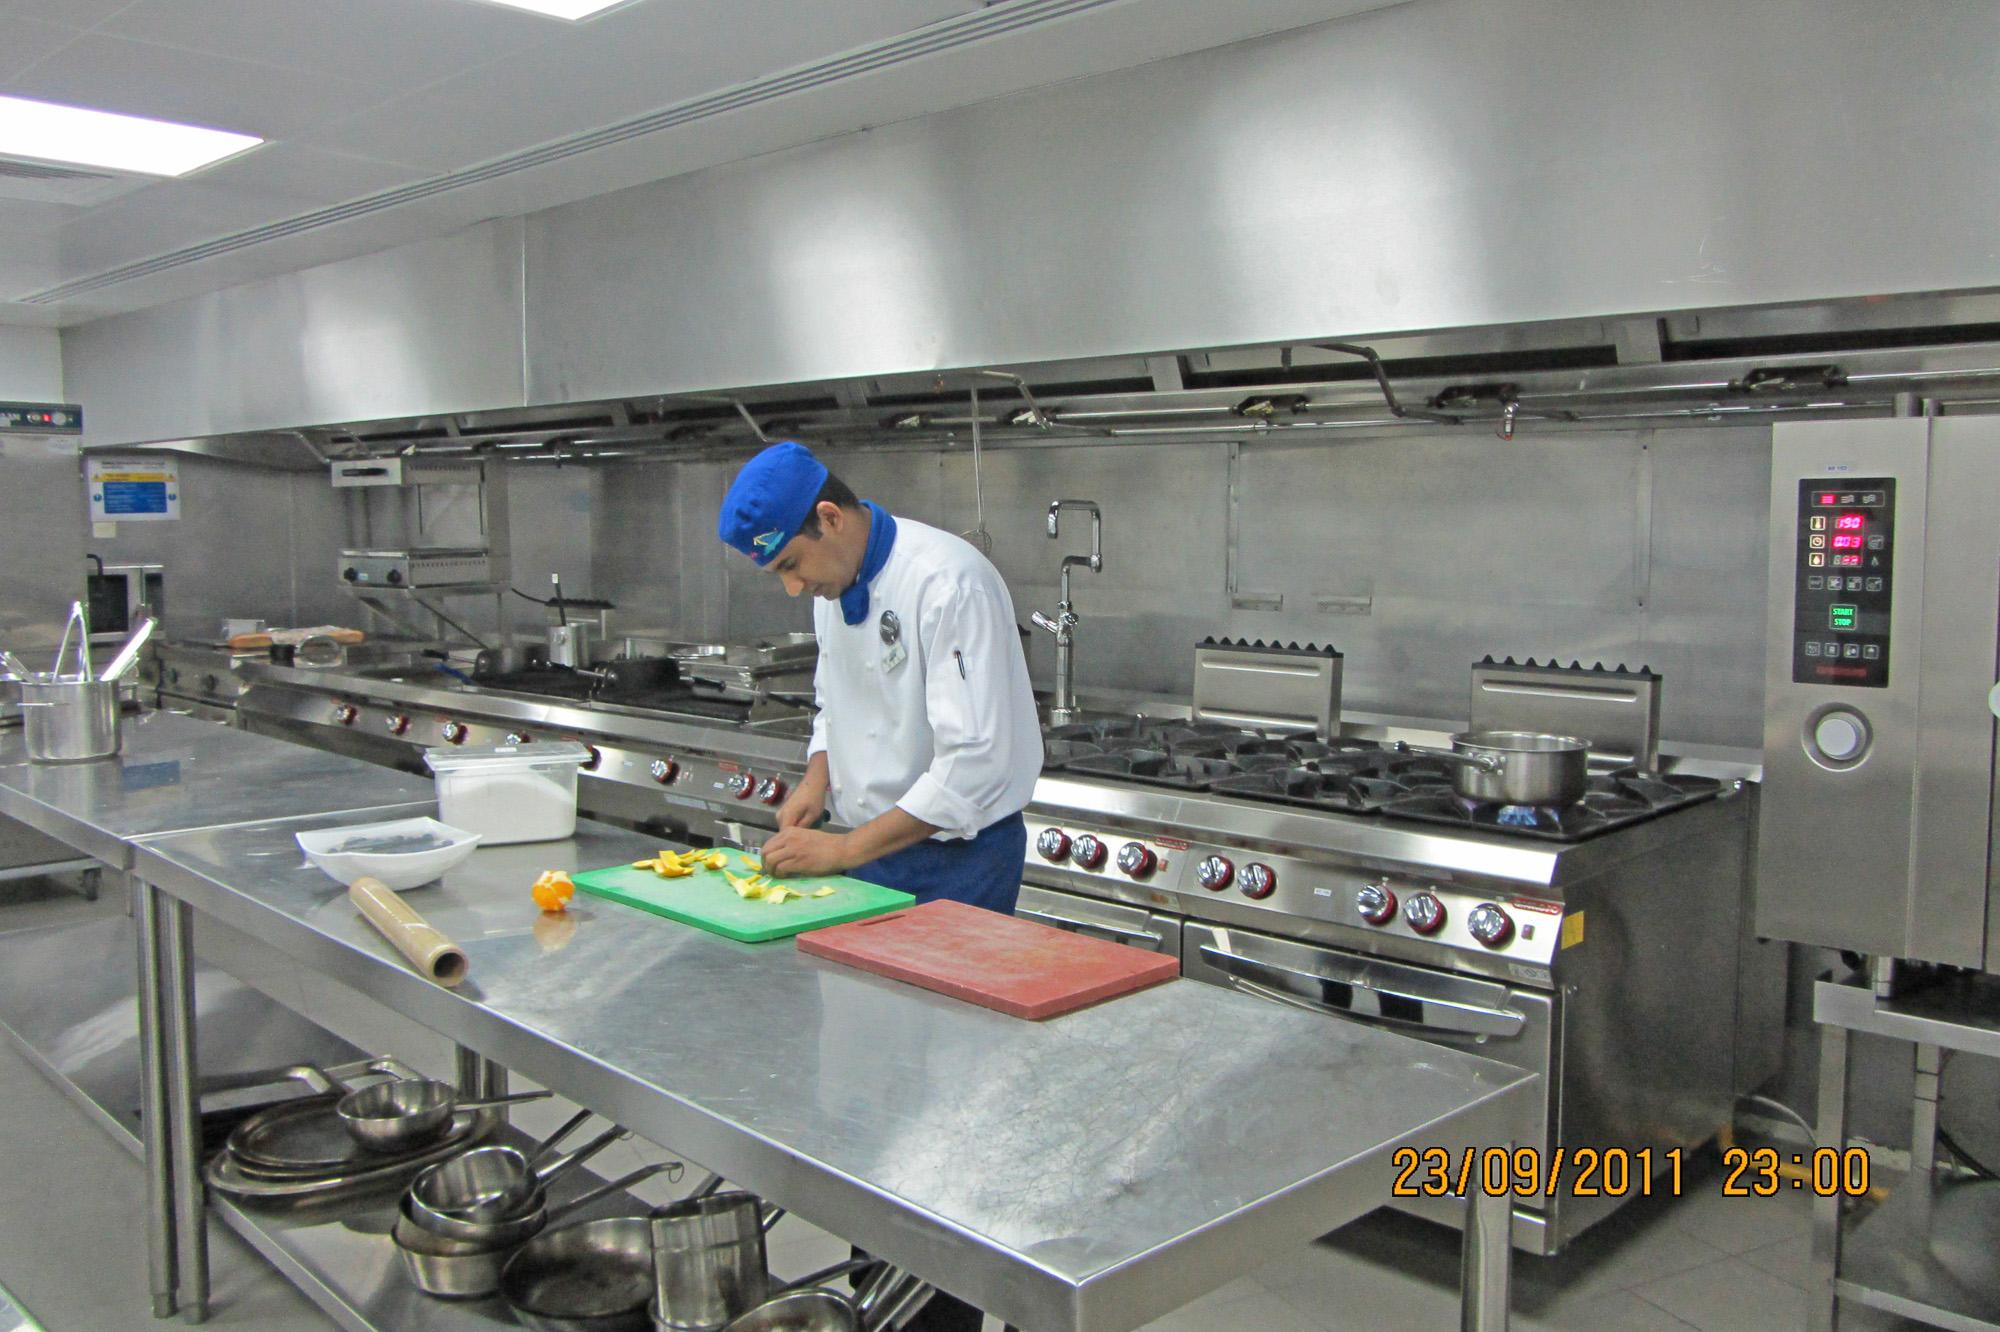 Italia_kitchen_-le_meridien_r-6